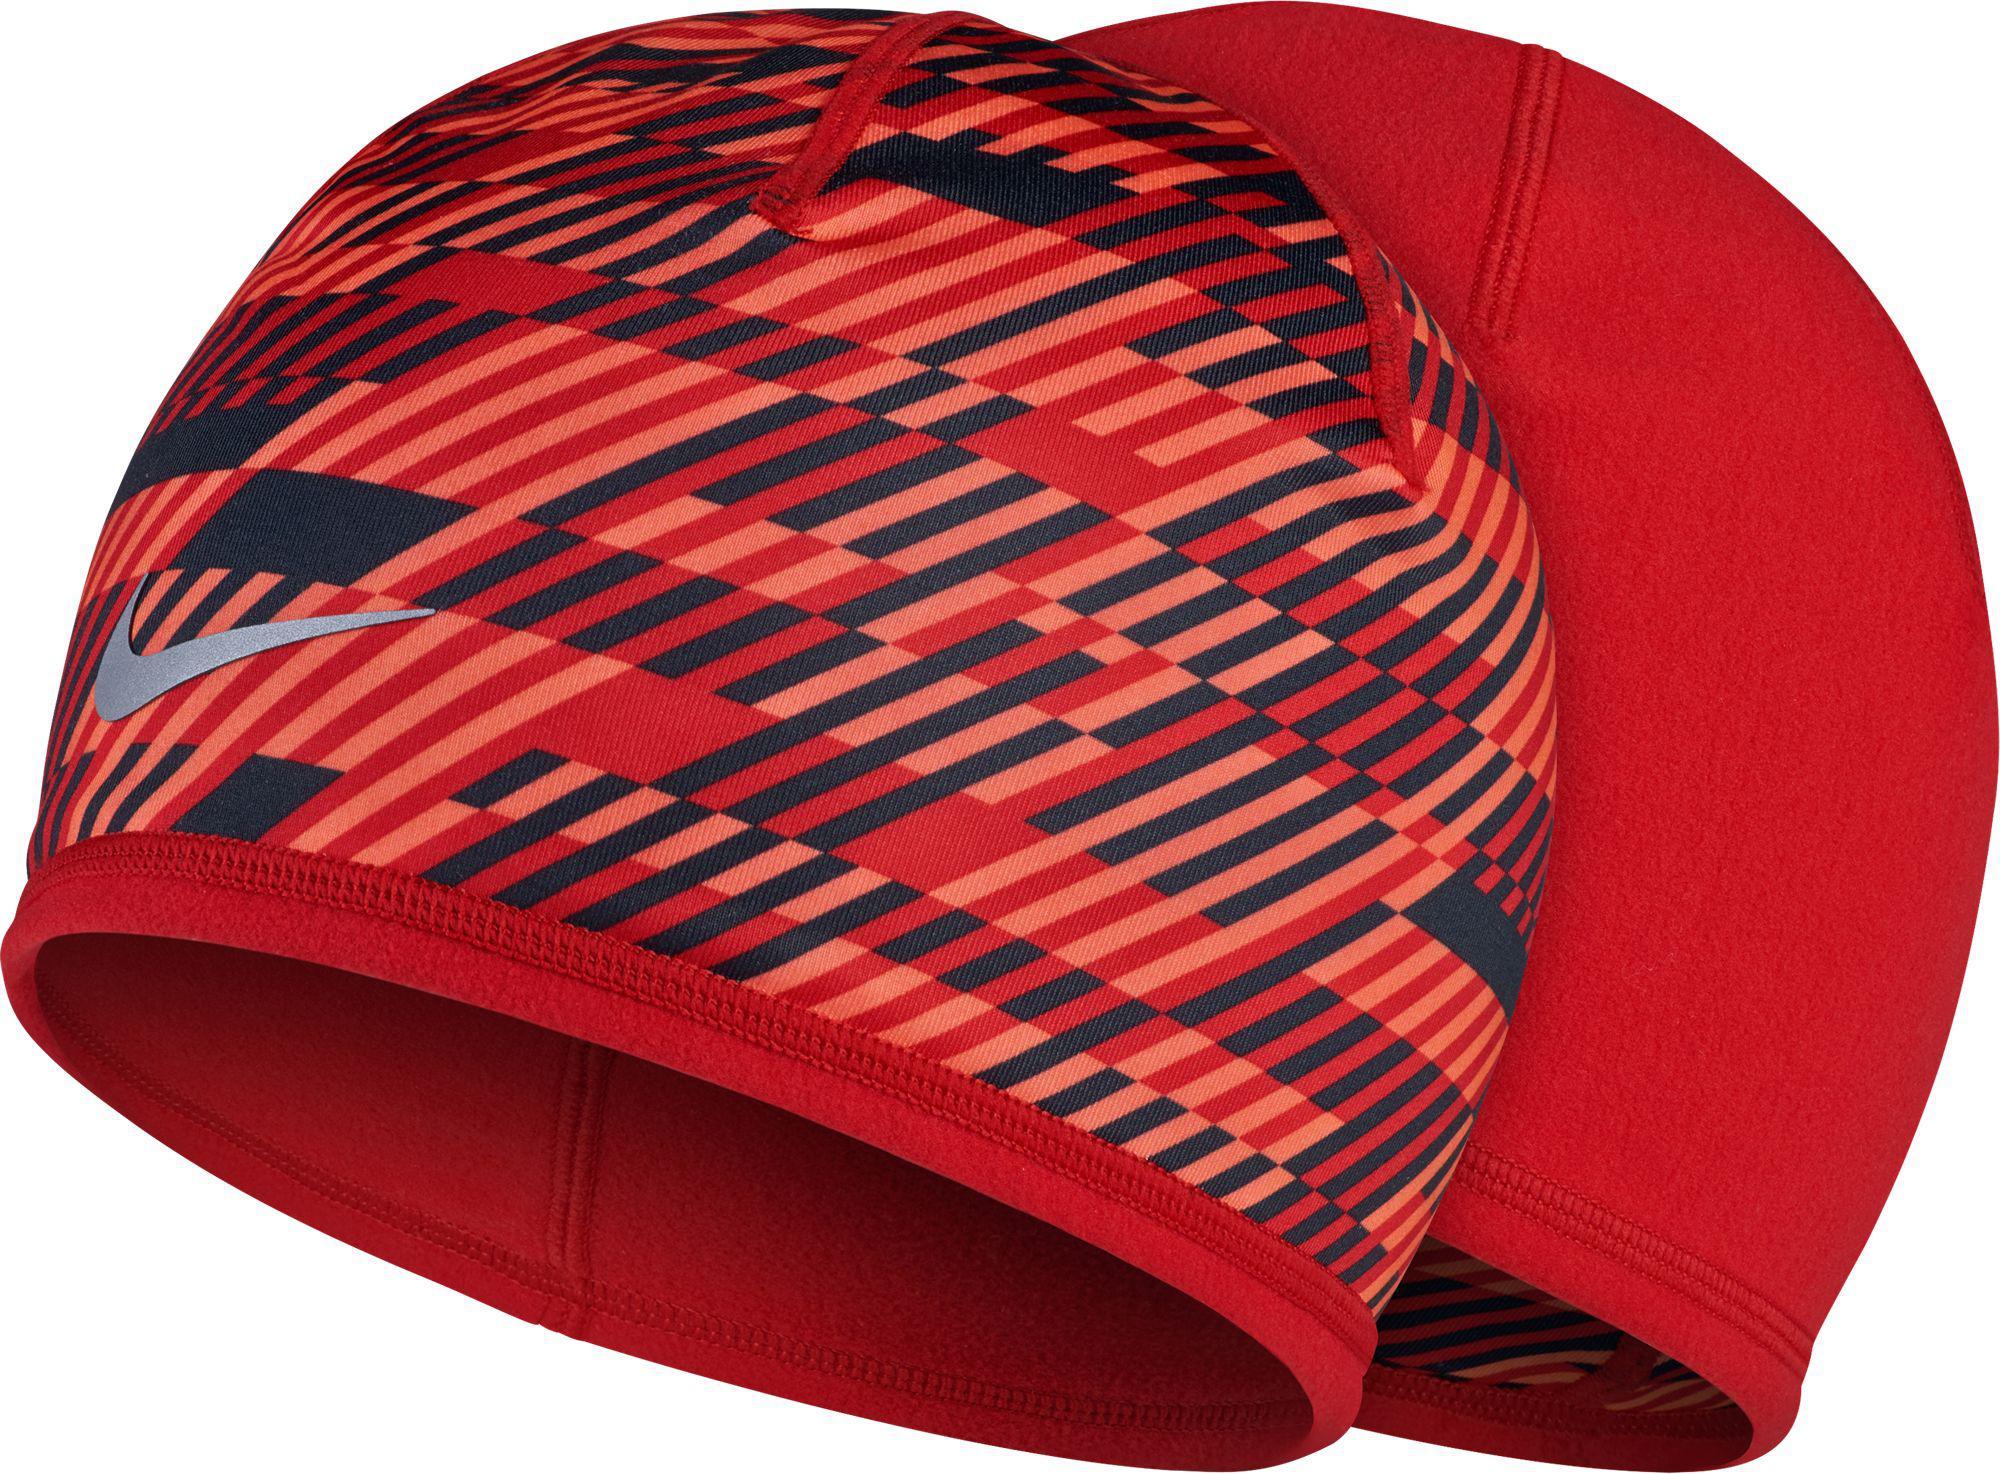 Lyst - Nike Run Hazard Knit Running Hat in Red for Men 508525ad77f